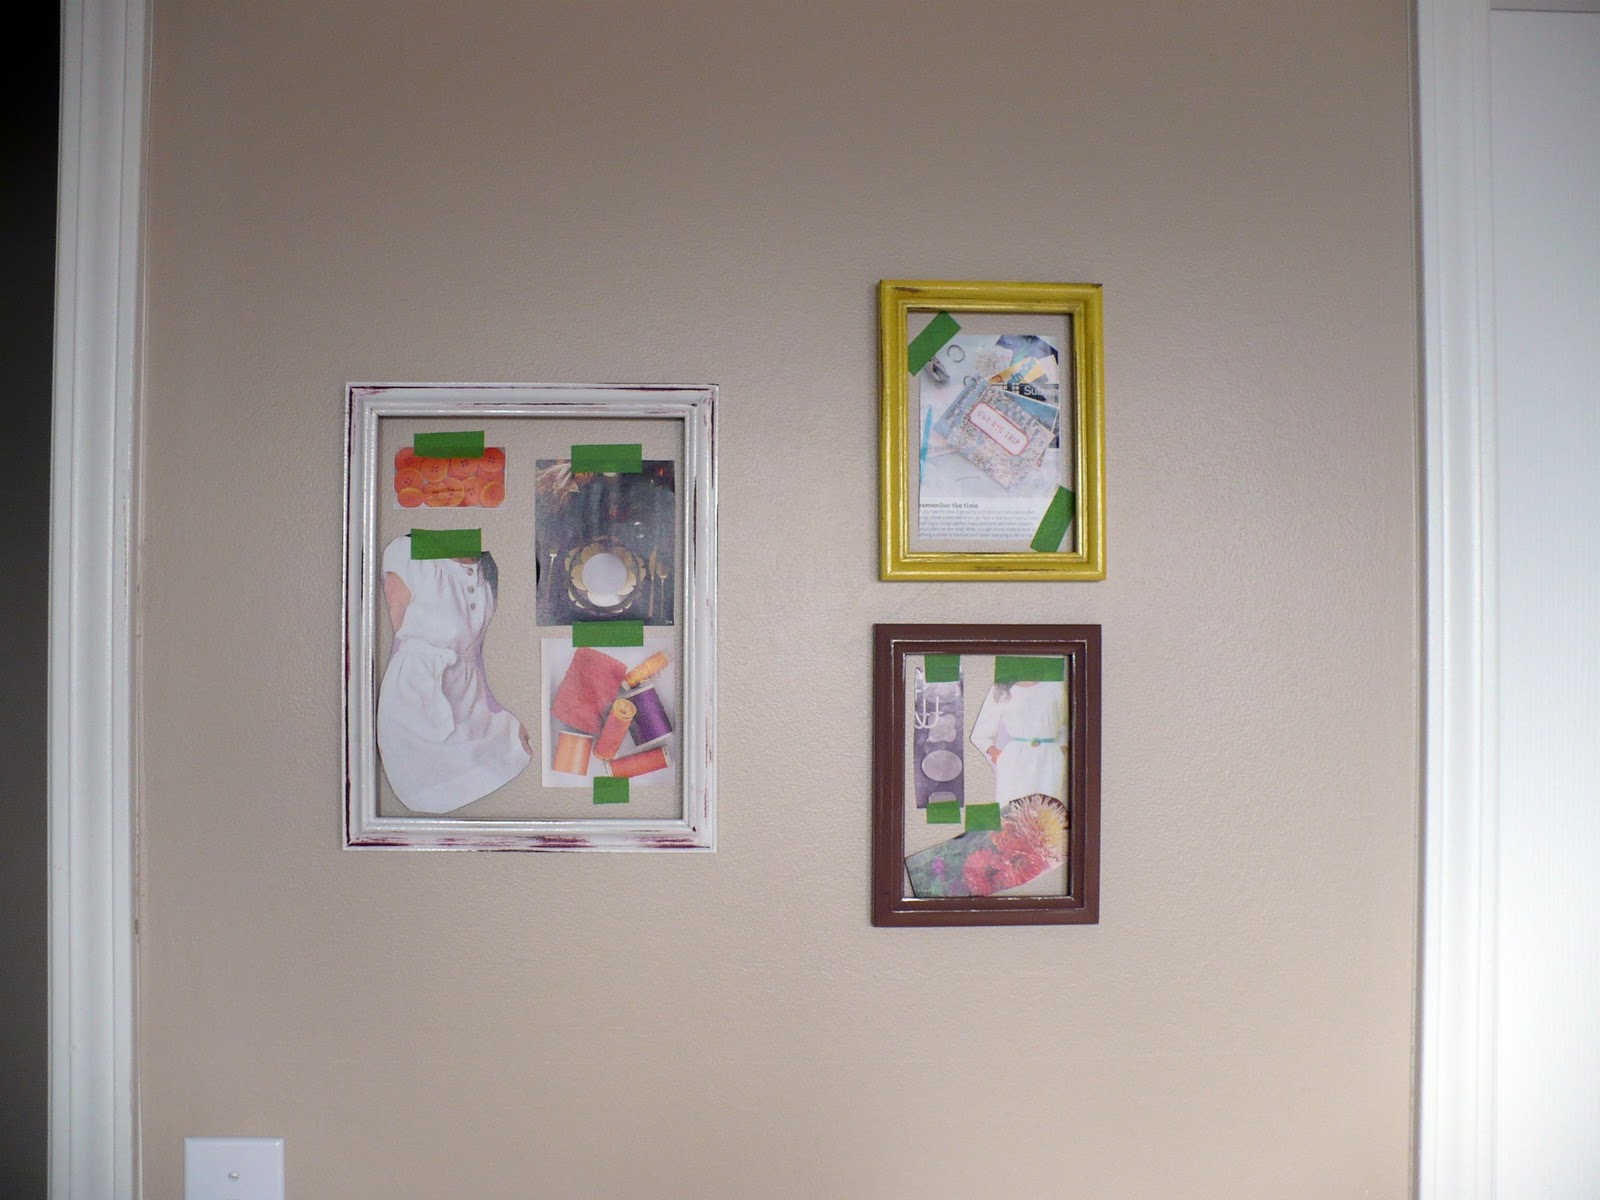 The Polka-Dot Umbrella: Inspiration Frames